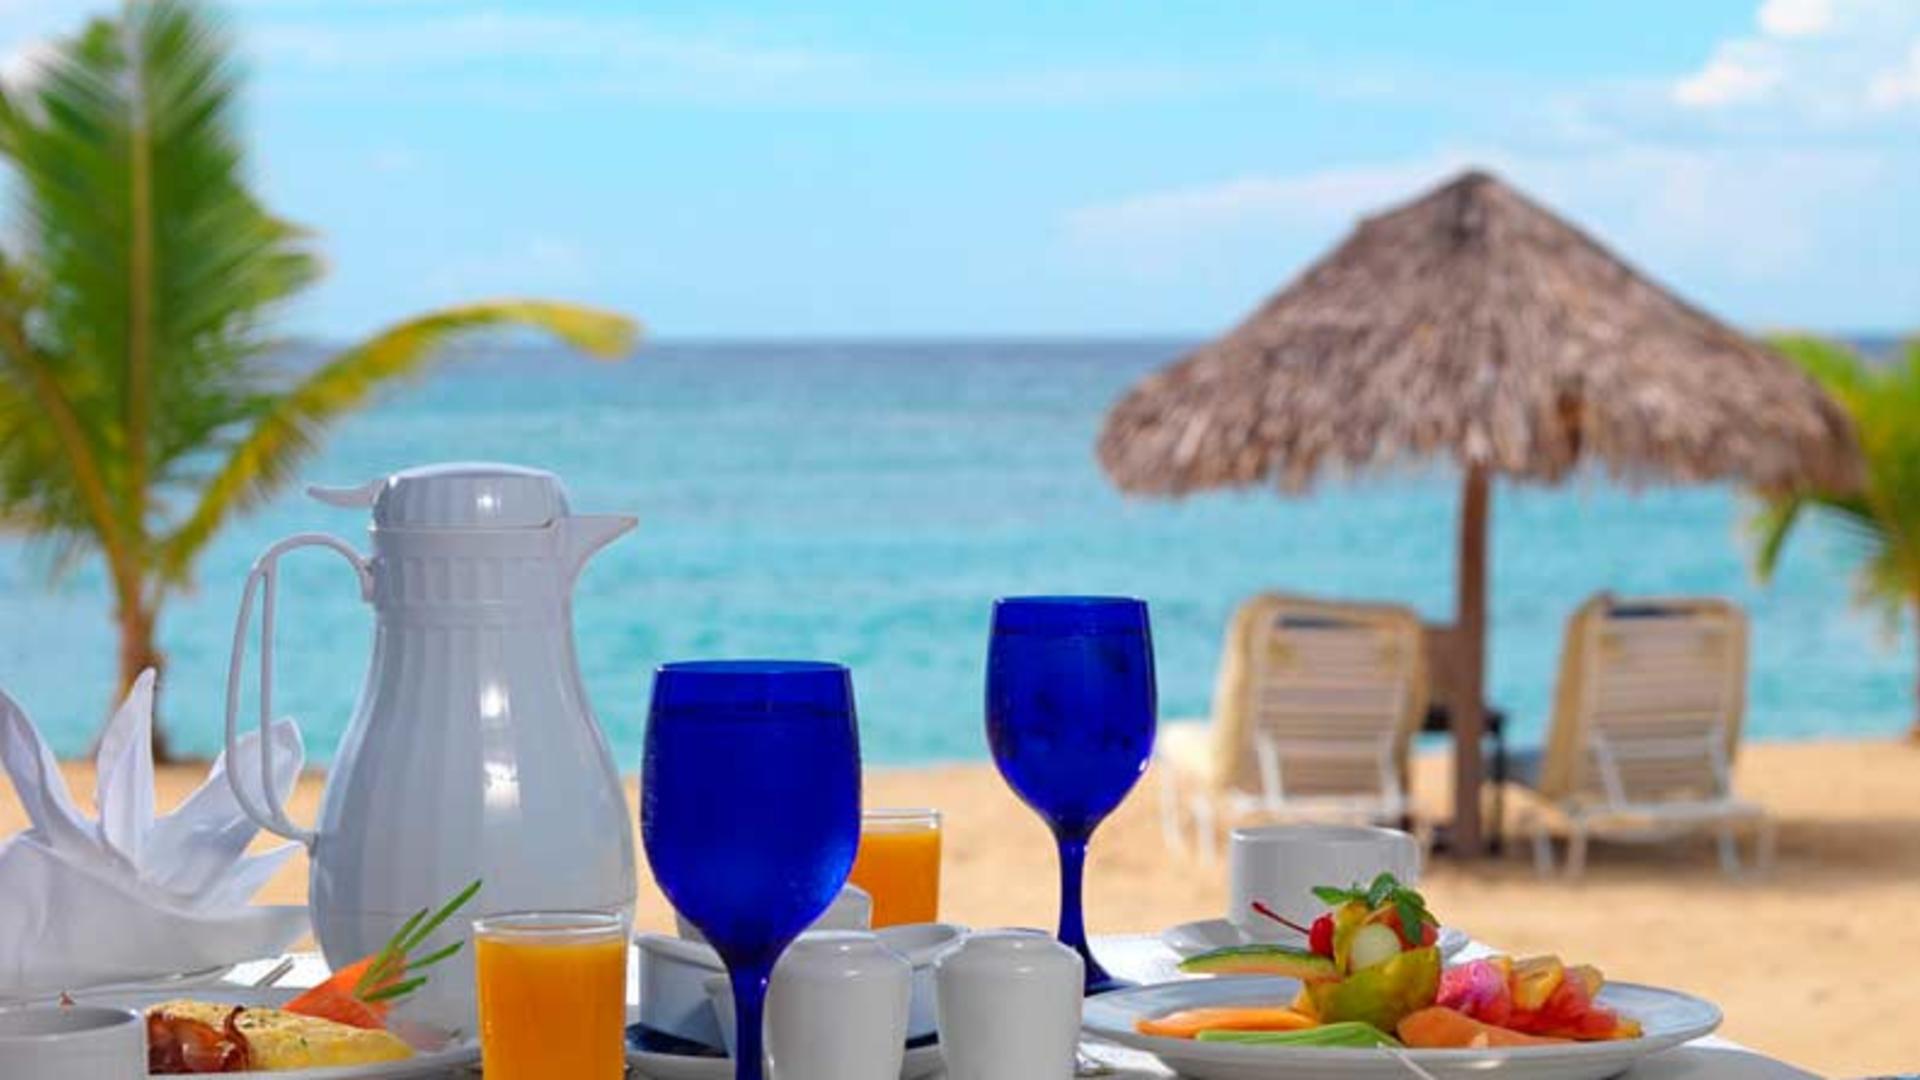 dining-on-the-beach